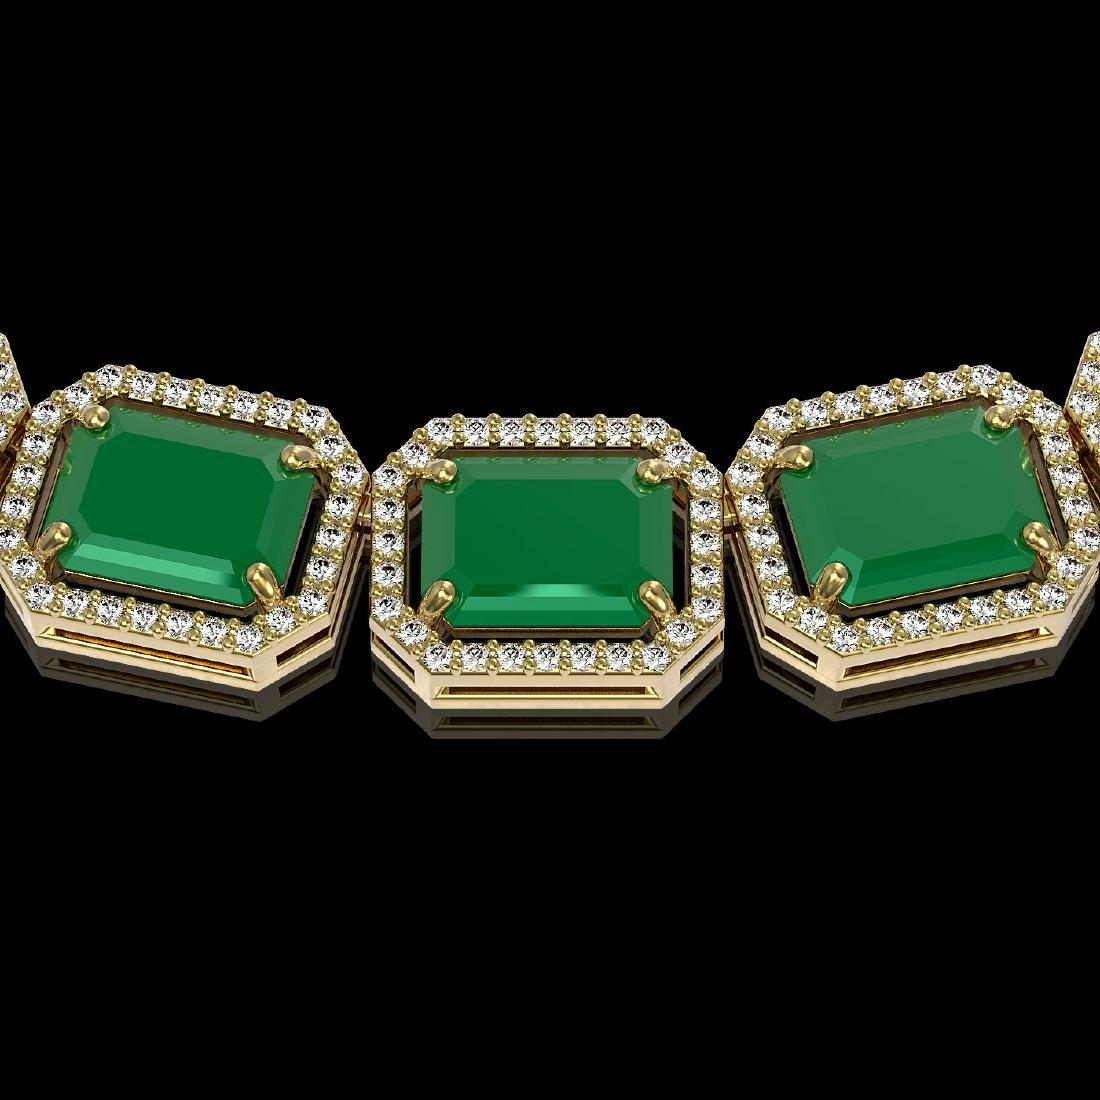 84.94 CTW Emerald & Diamond Halo Necklace 10K Yellow - 3